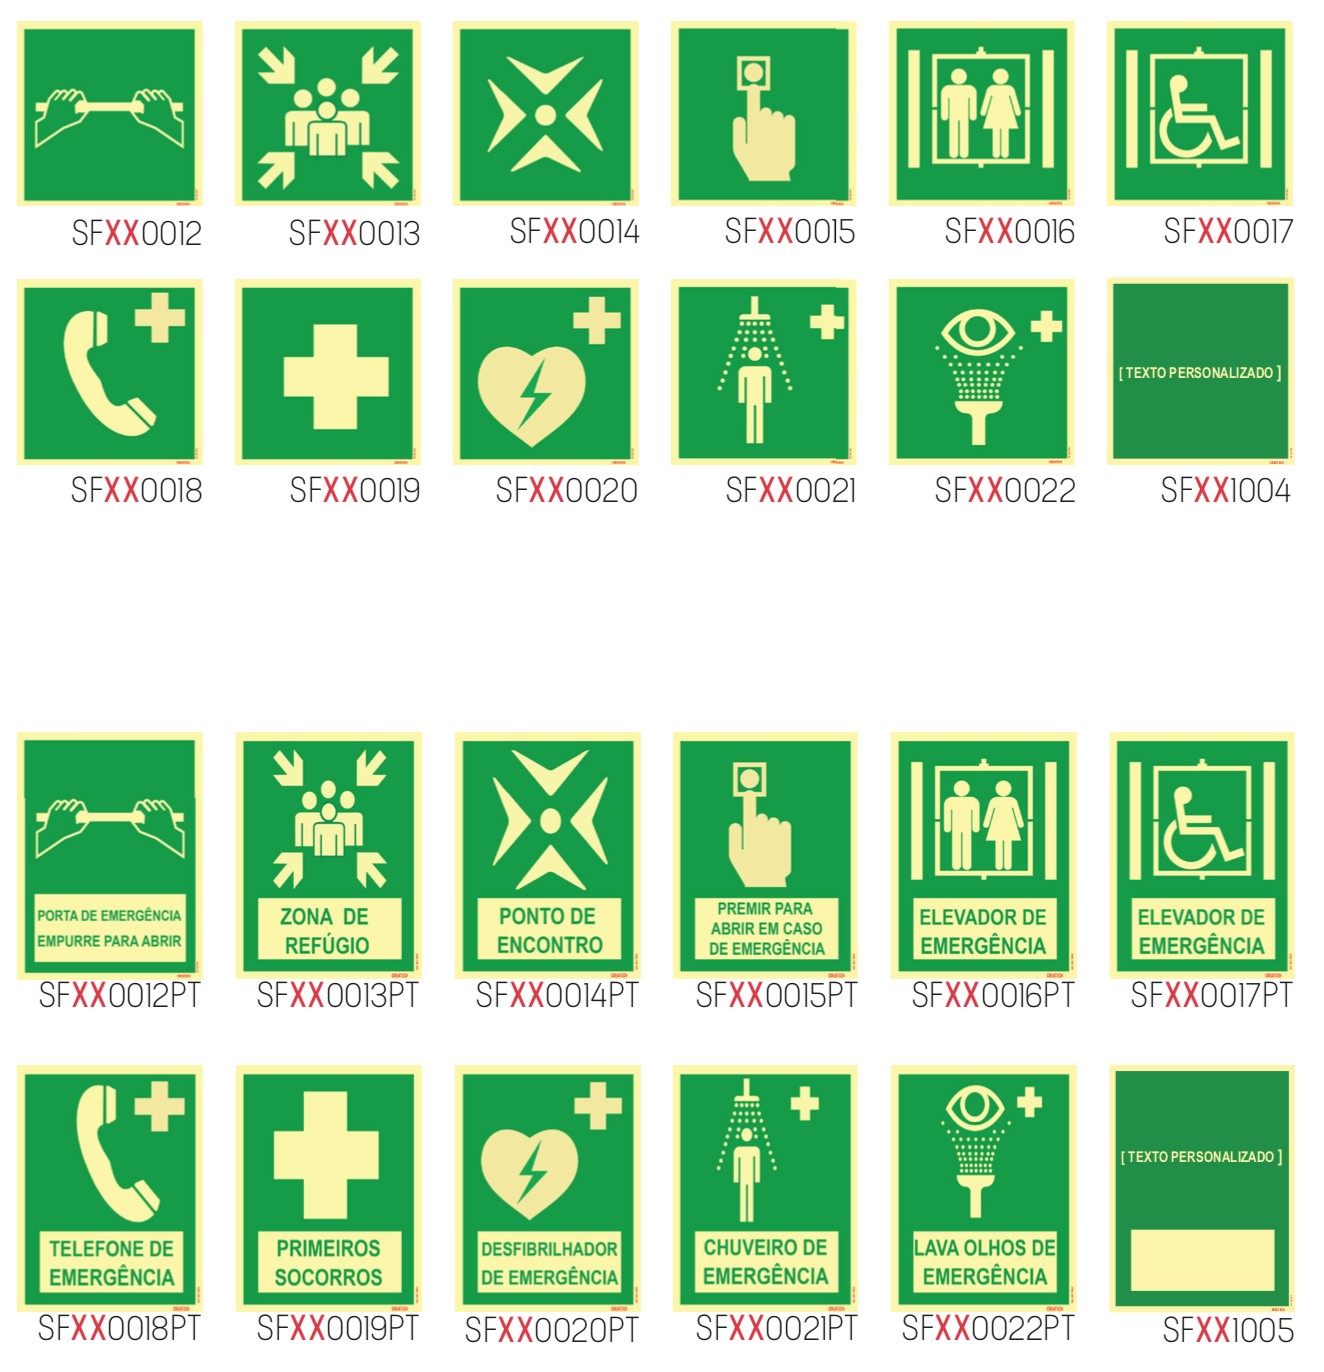 equipamentos_emergencia